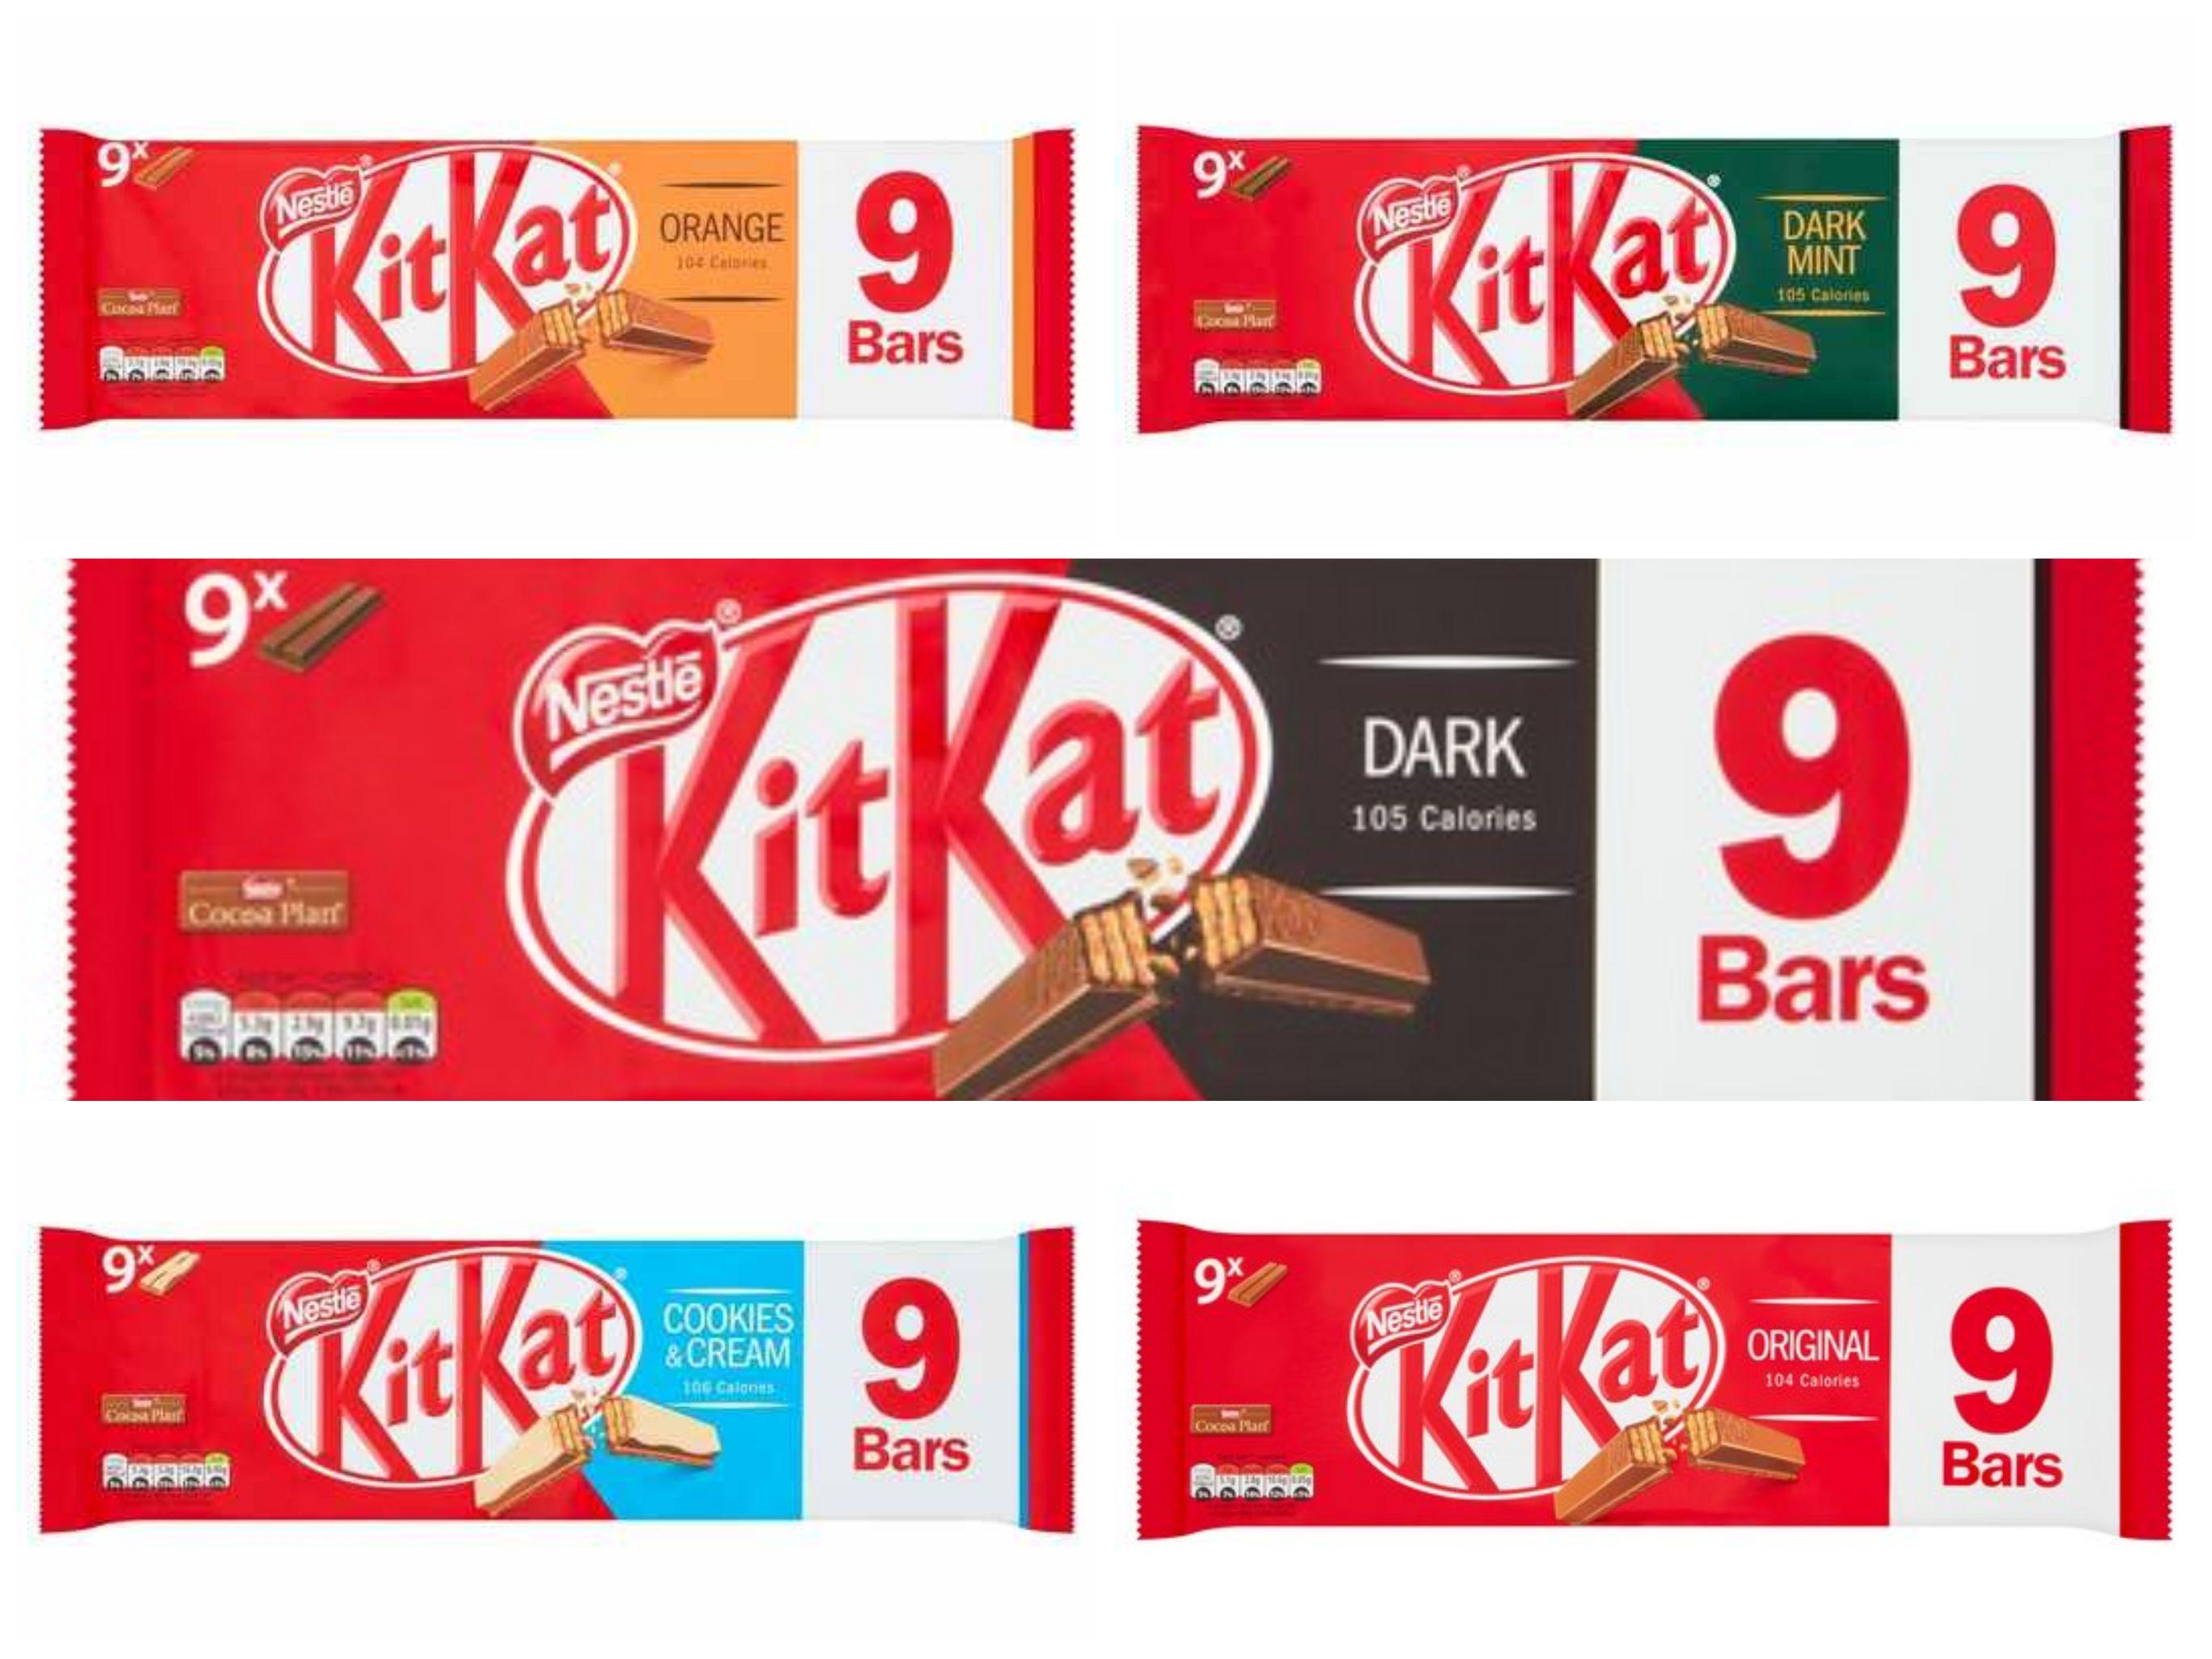 Kit Kat 2 Fingers 9 pack - All Flavours (Dark / Orange / Cookies & Cream / Mint / Milk) for £1 @ Tesco